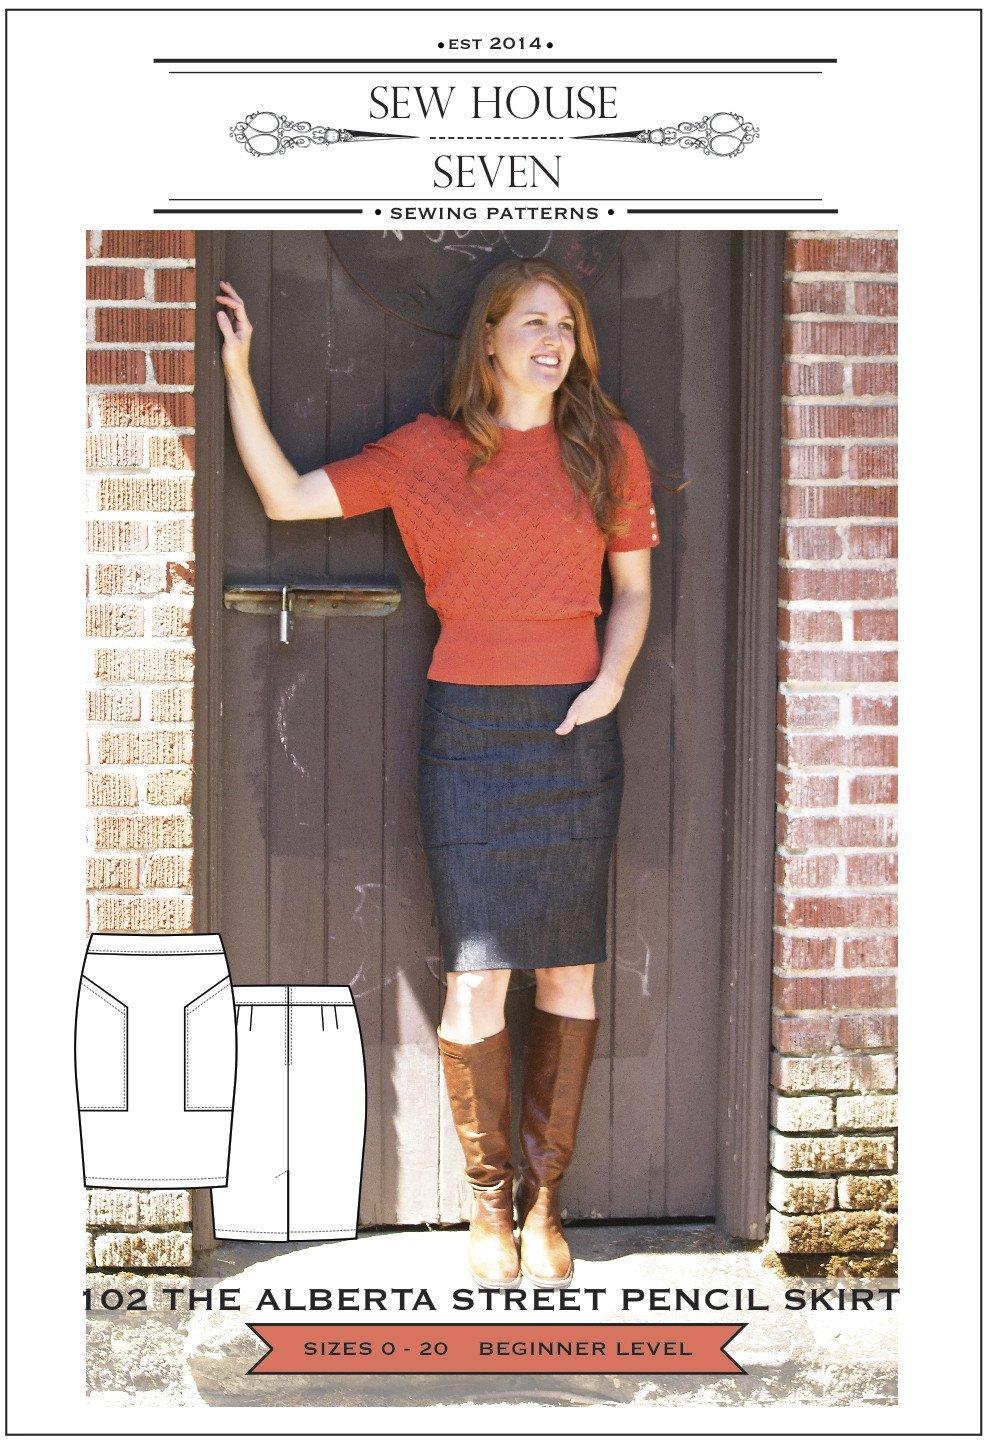 Sew House Seven - The Alberta Street Pencil Skirt